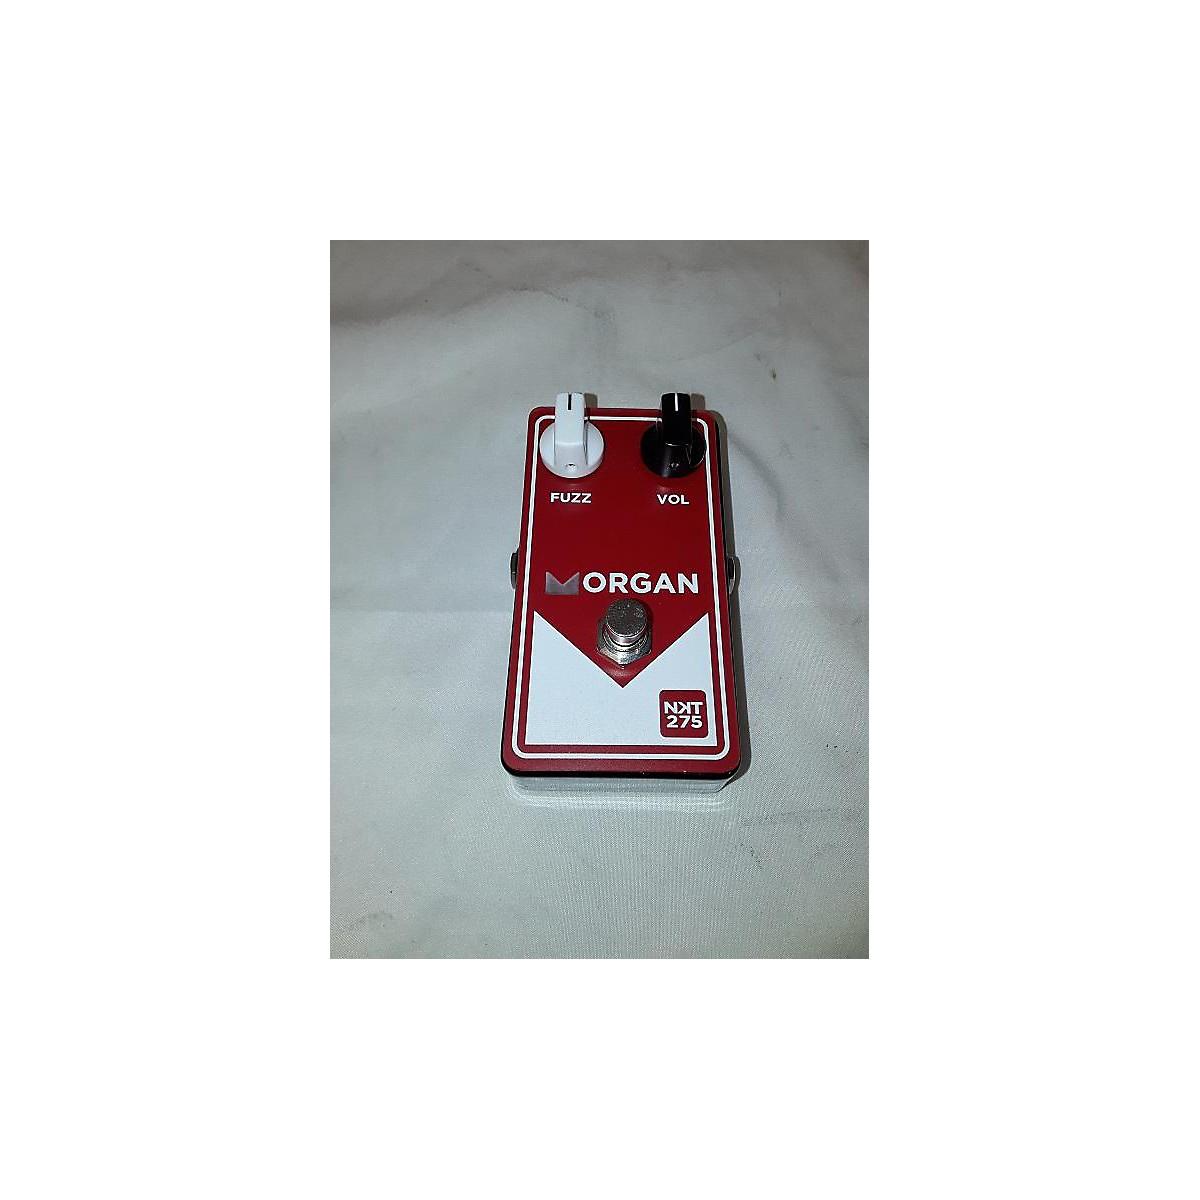 Morgan Amplification NKT275 Effect Pedal